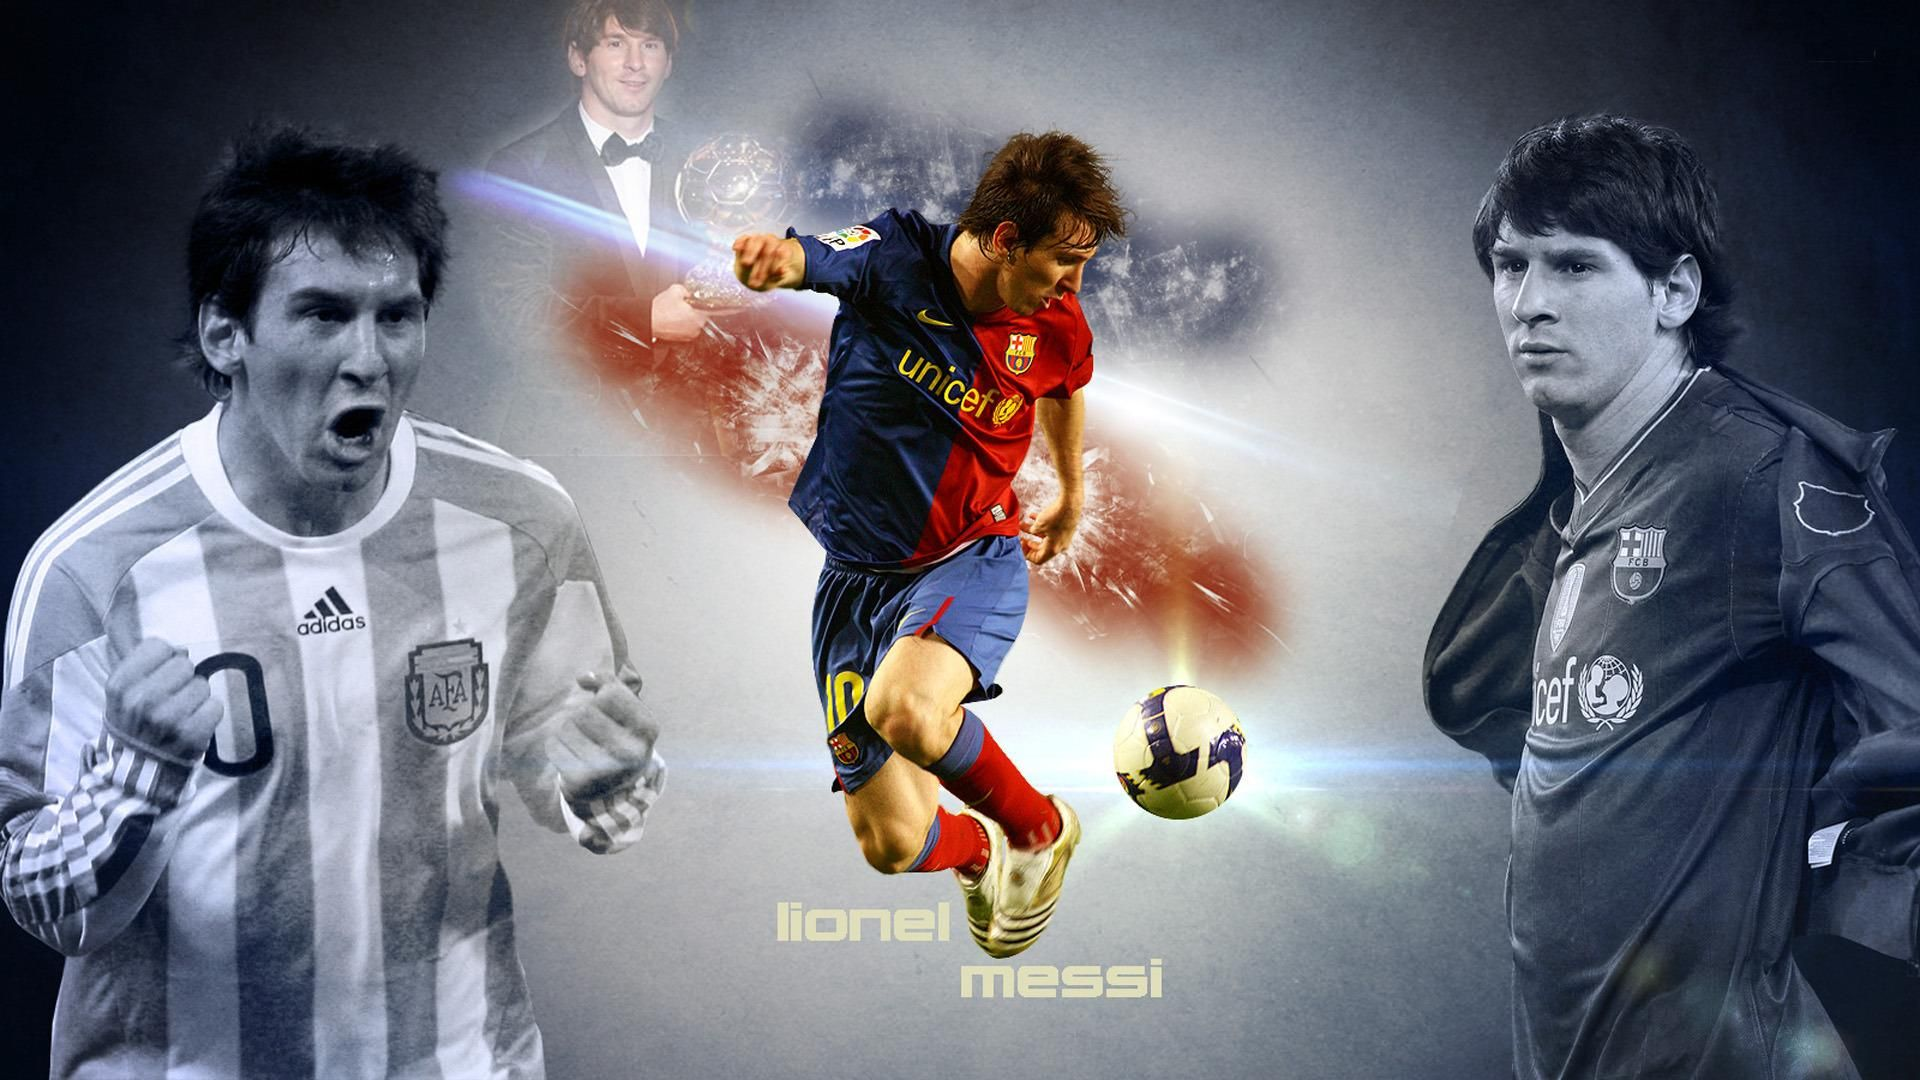 Google themes messi - Lionel Messi Fc Barcelona Vs Psg Uefa Champions League Wallpaper